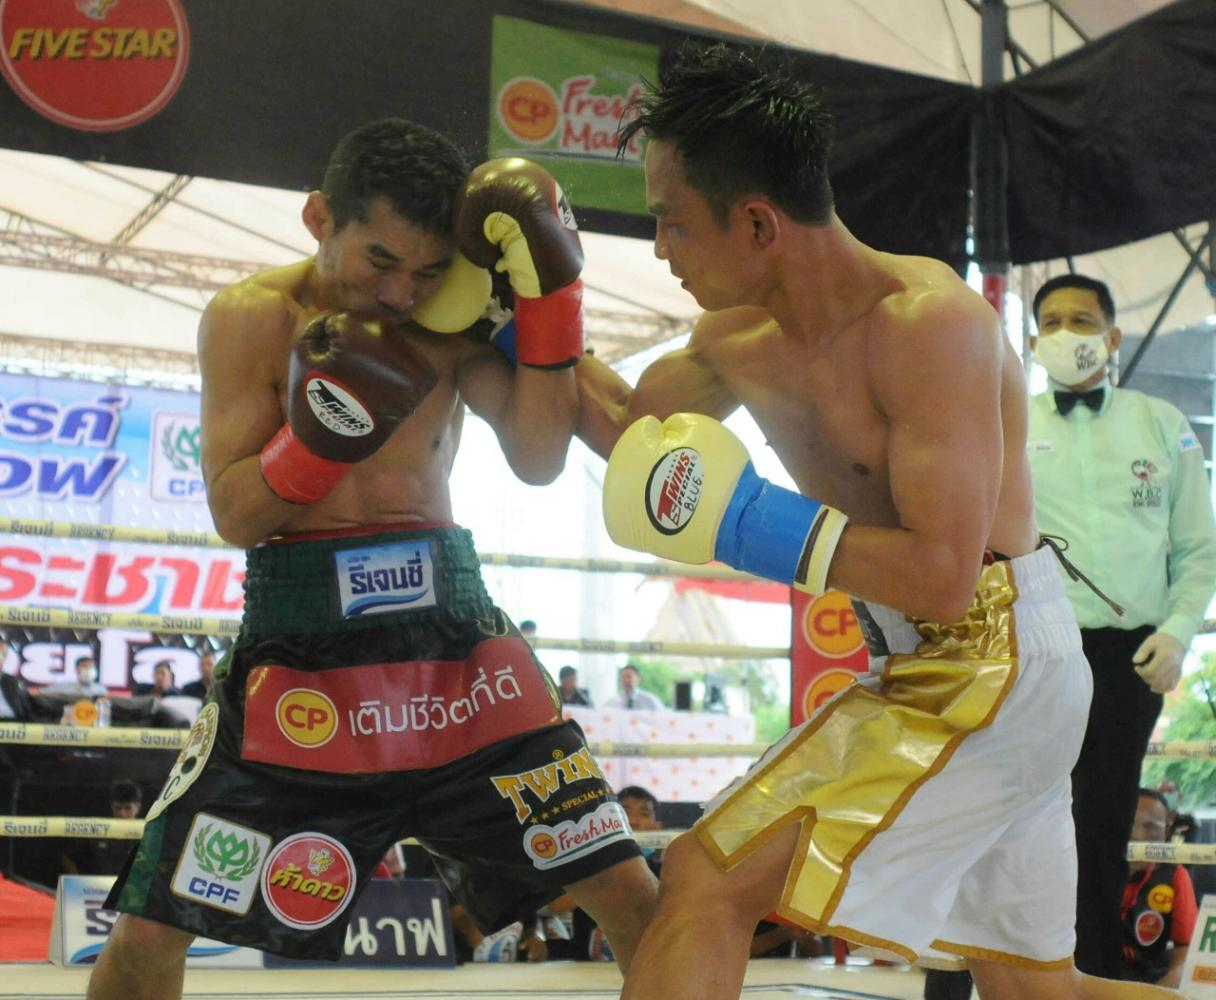 Stunning blow: Panya Pradabsri (right) punches Wanheng Menayothin during their fight in Nakhon Sawan on Friday.